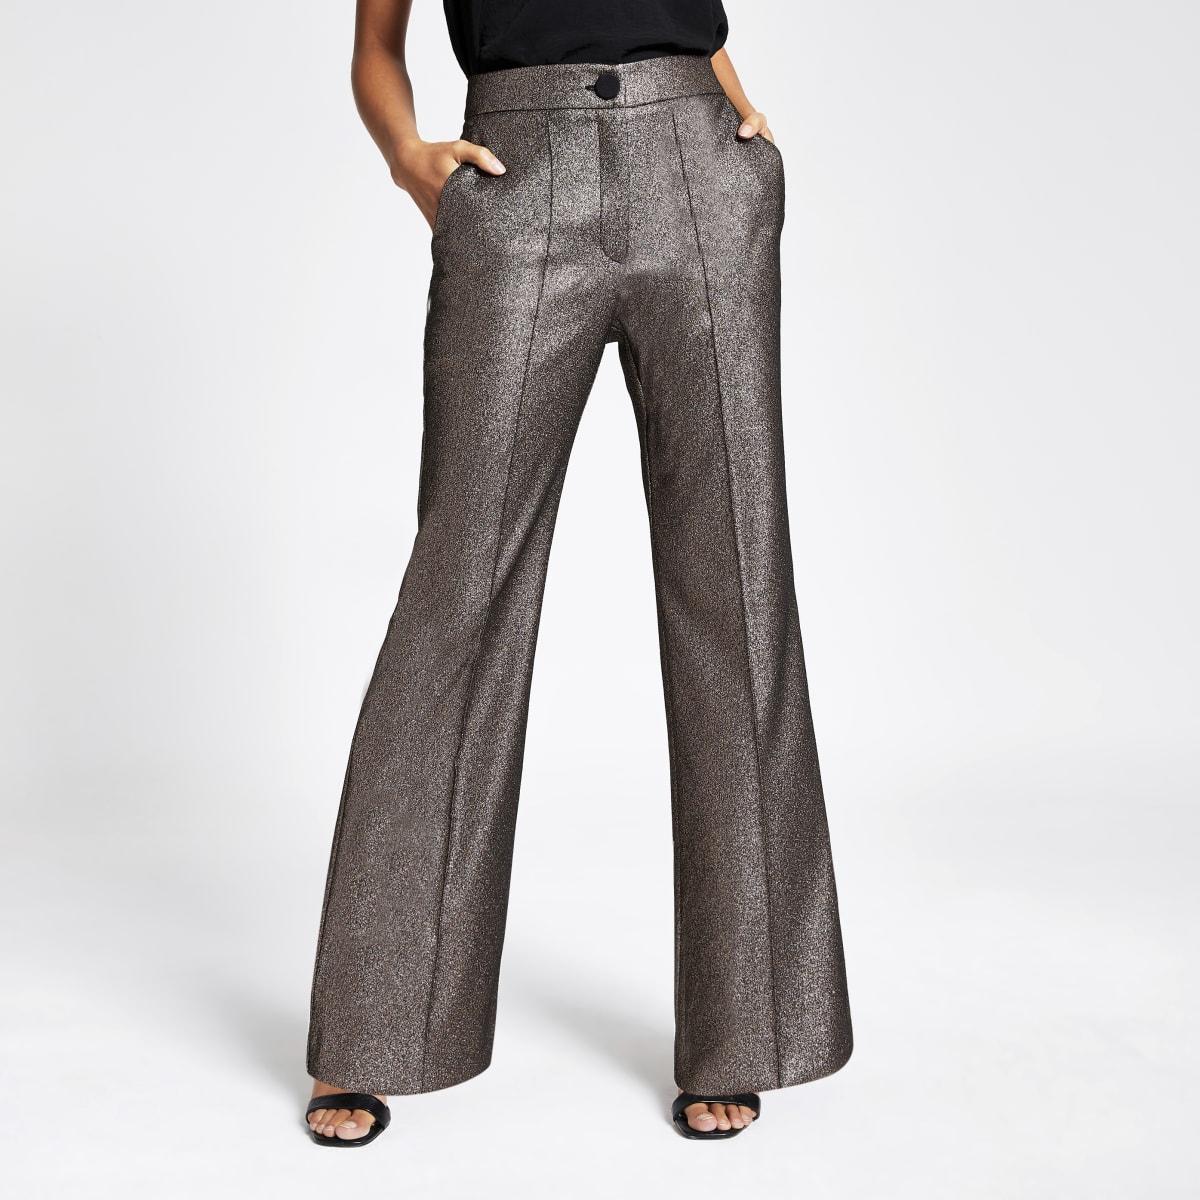 Goudkleurige metallic uitlopende broek met hoge taille